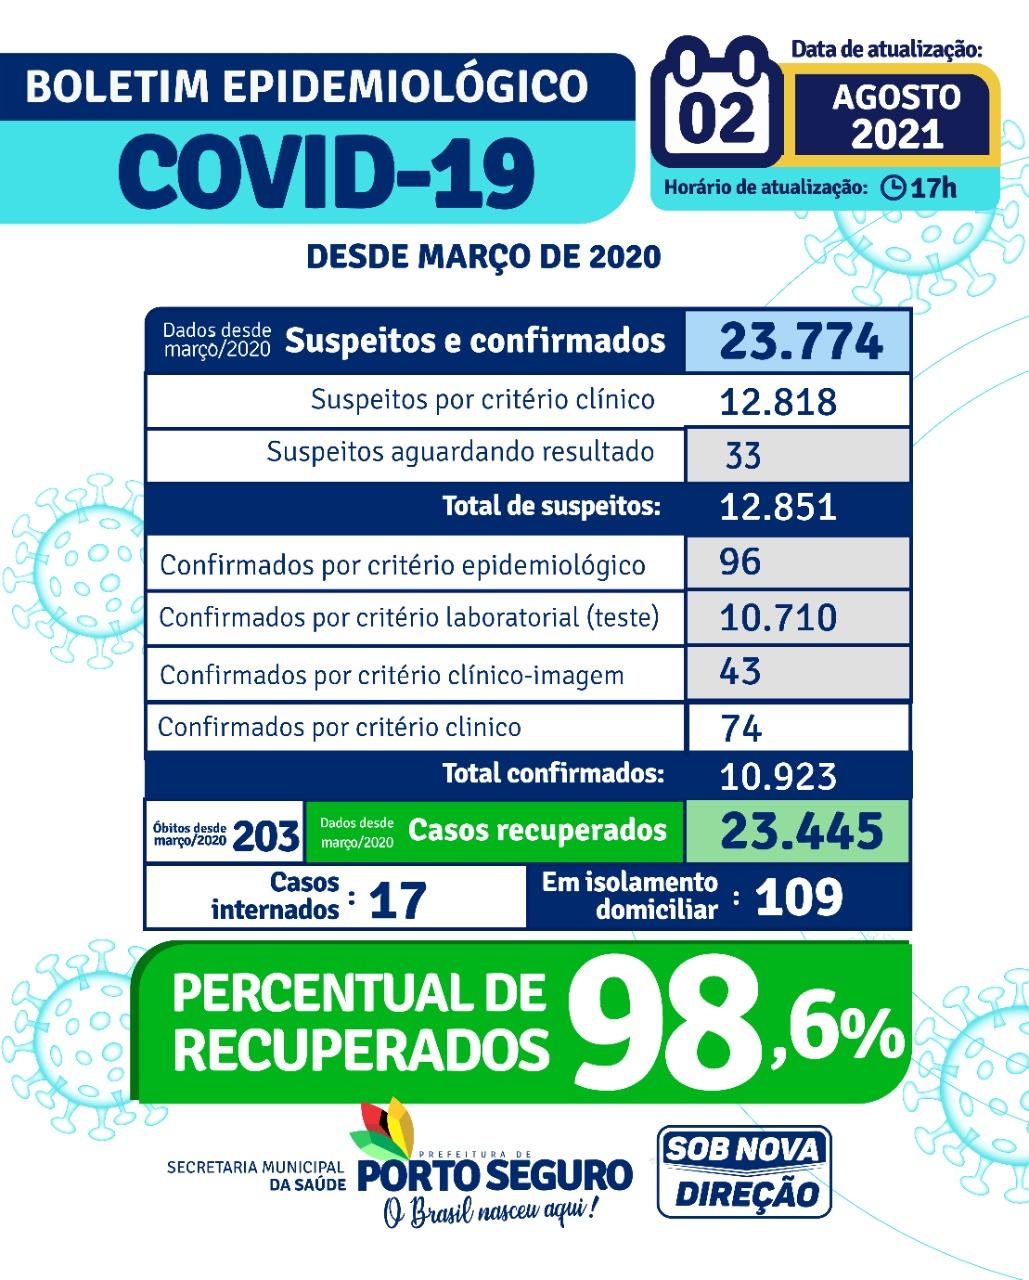 Porto Seguro: Boletim Epidemiológico Covid-19 (02 de agosto) 23